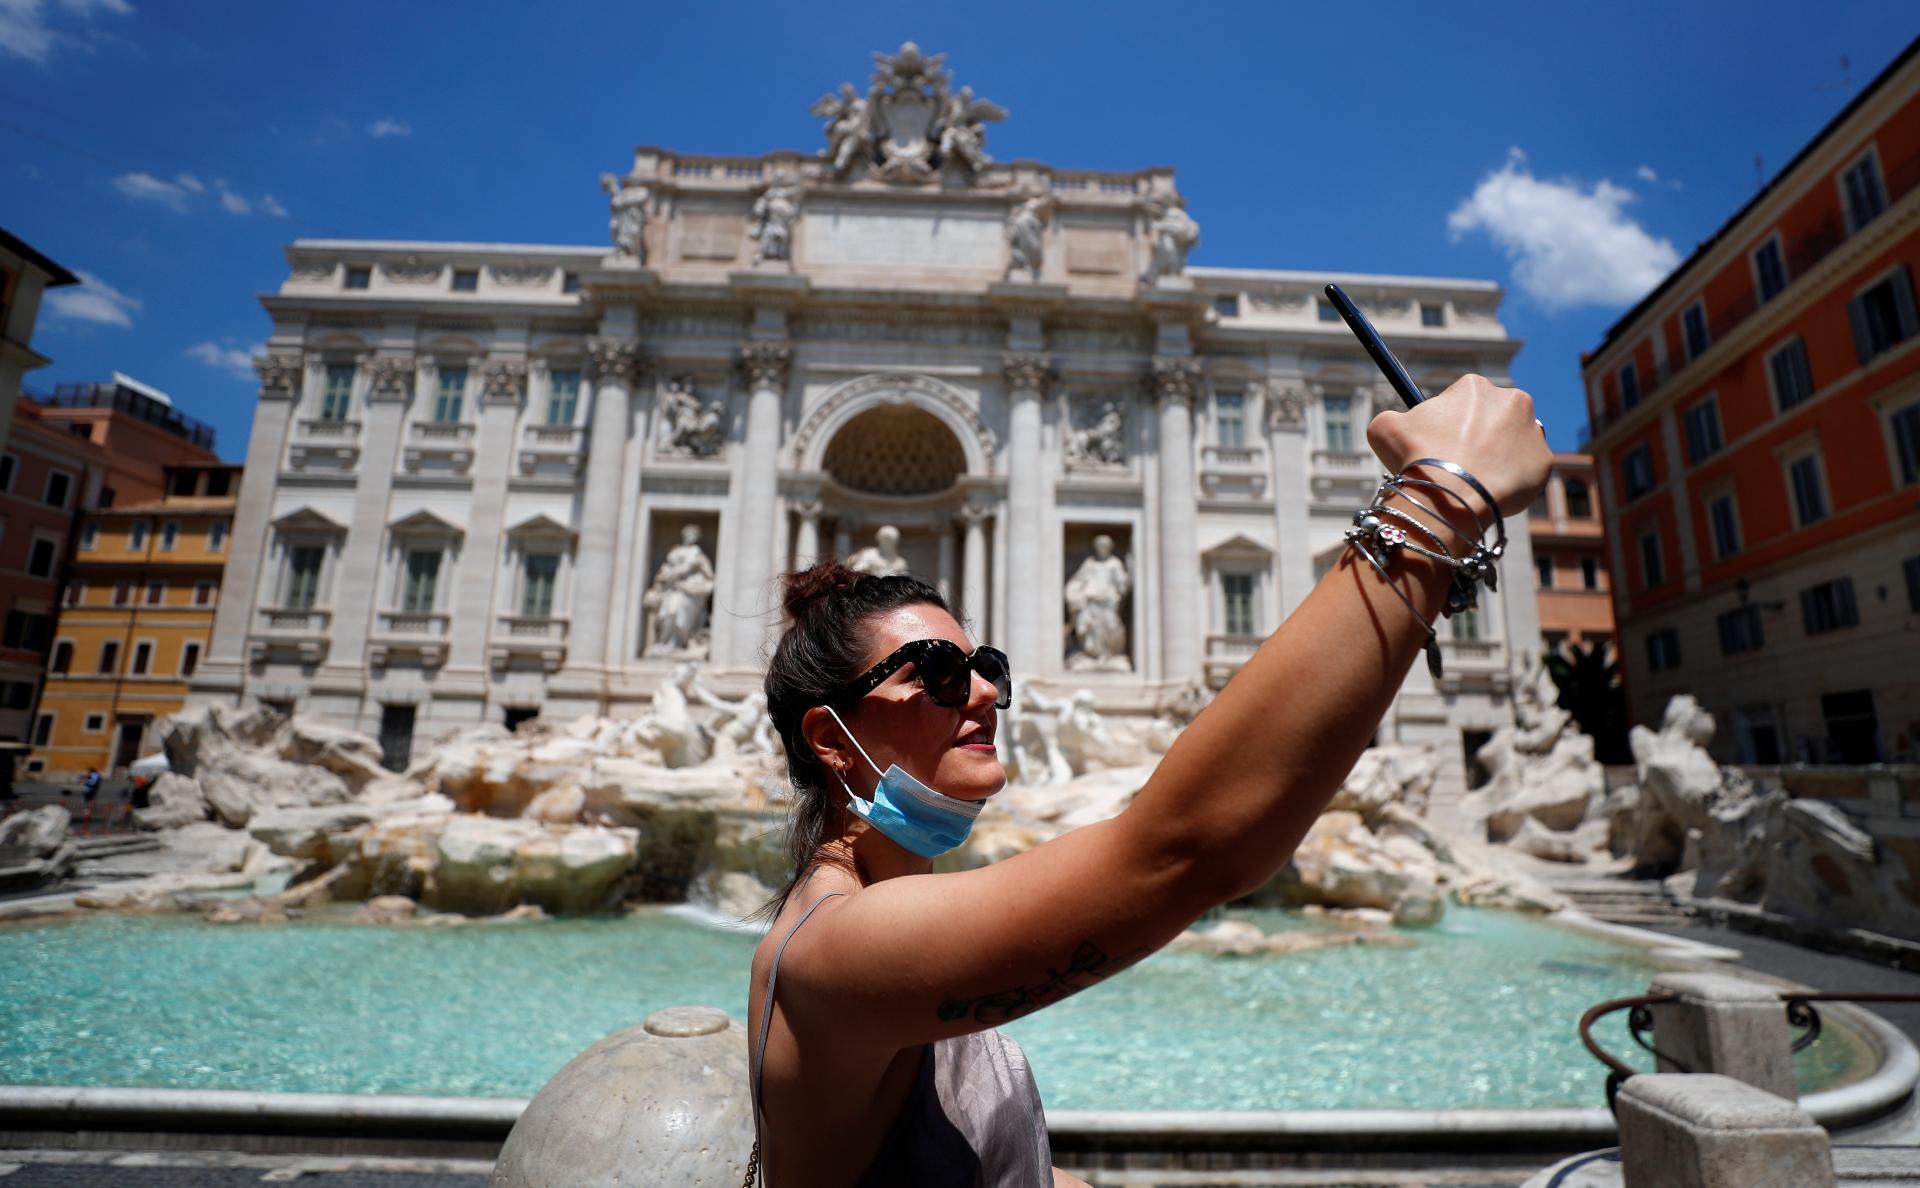 Фото: Guglielmo Mangiapane / Reuters